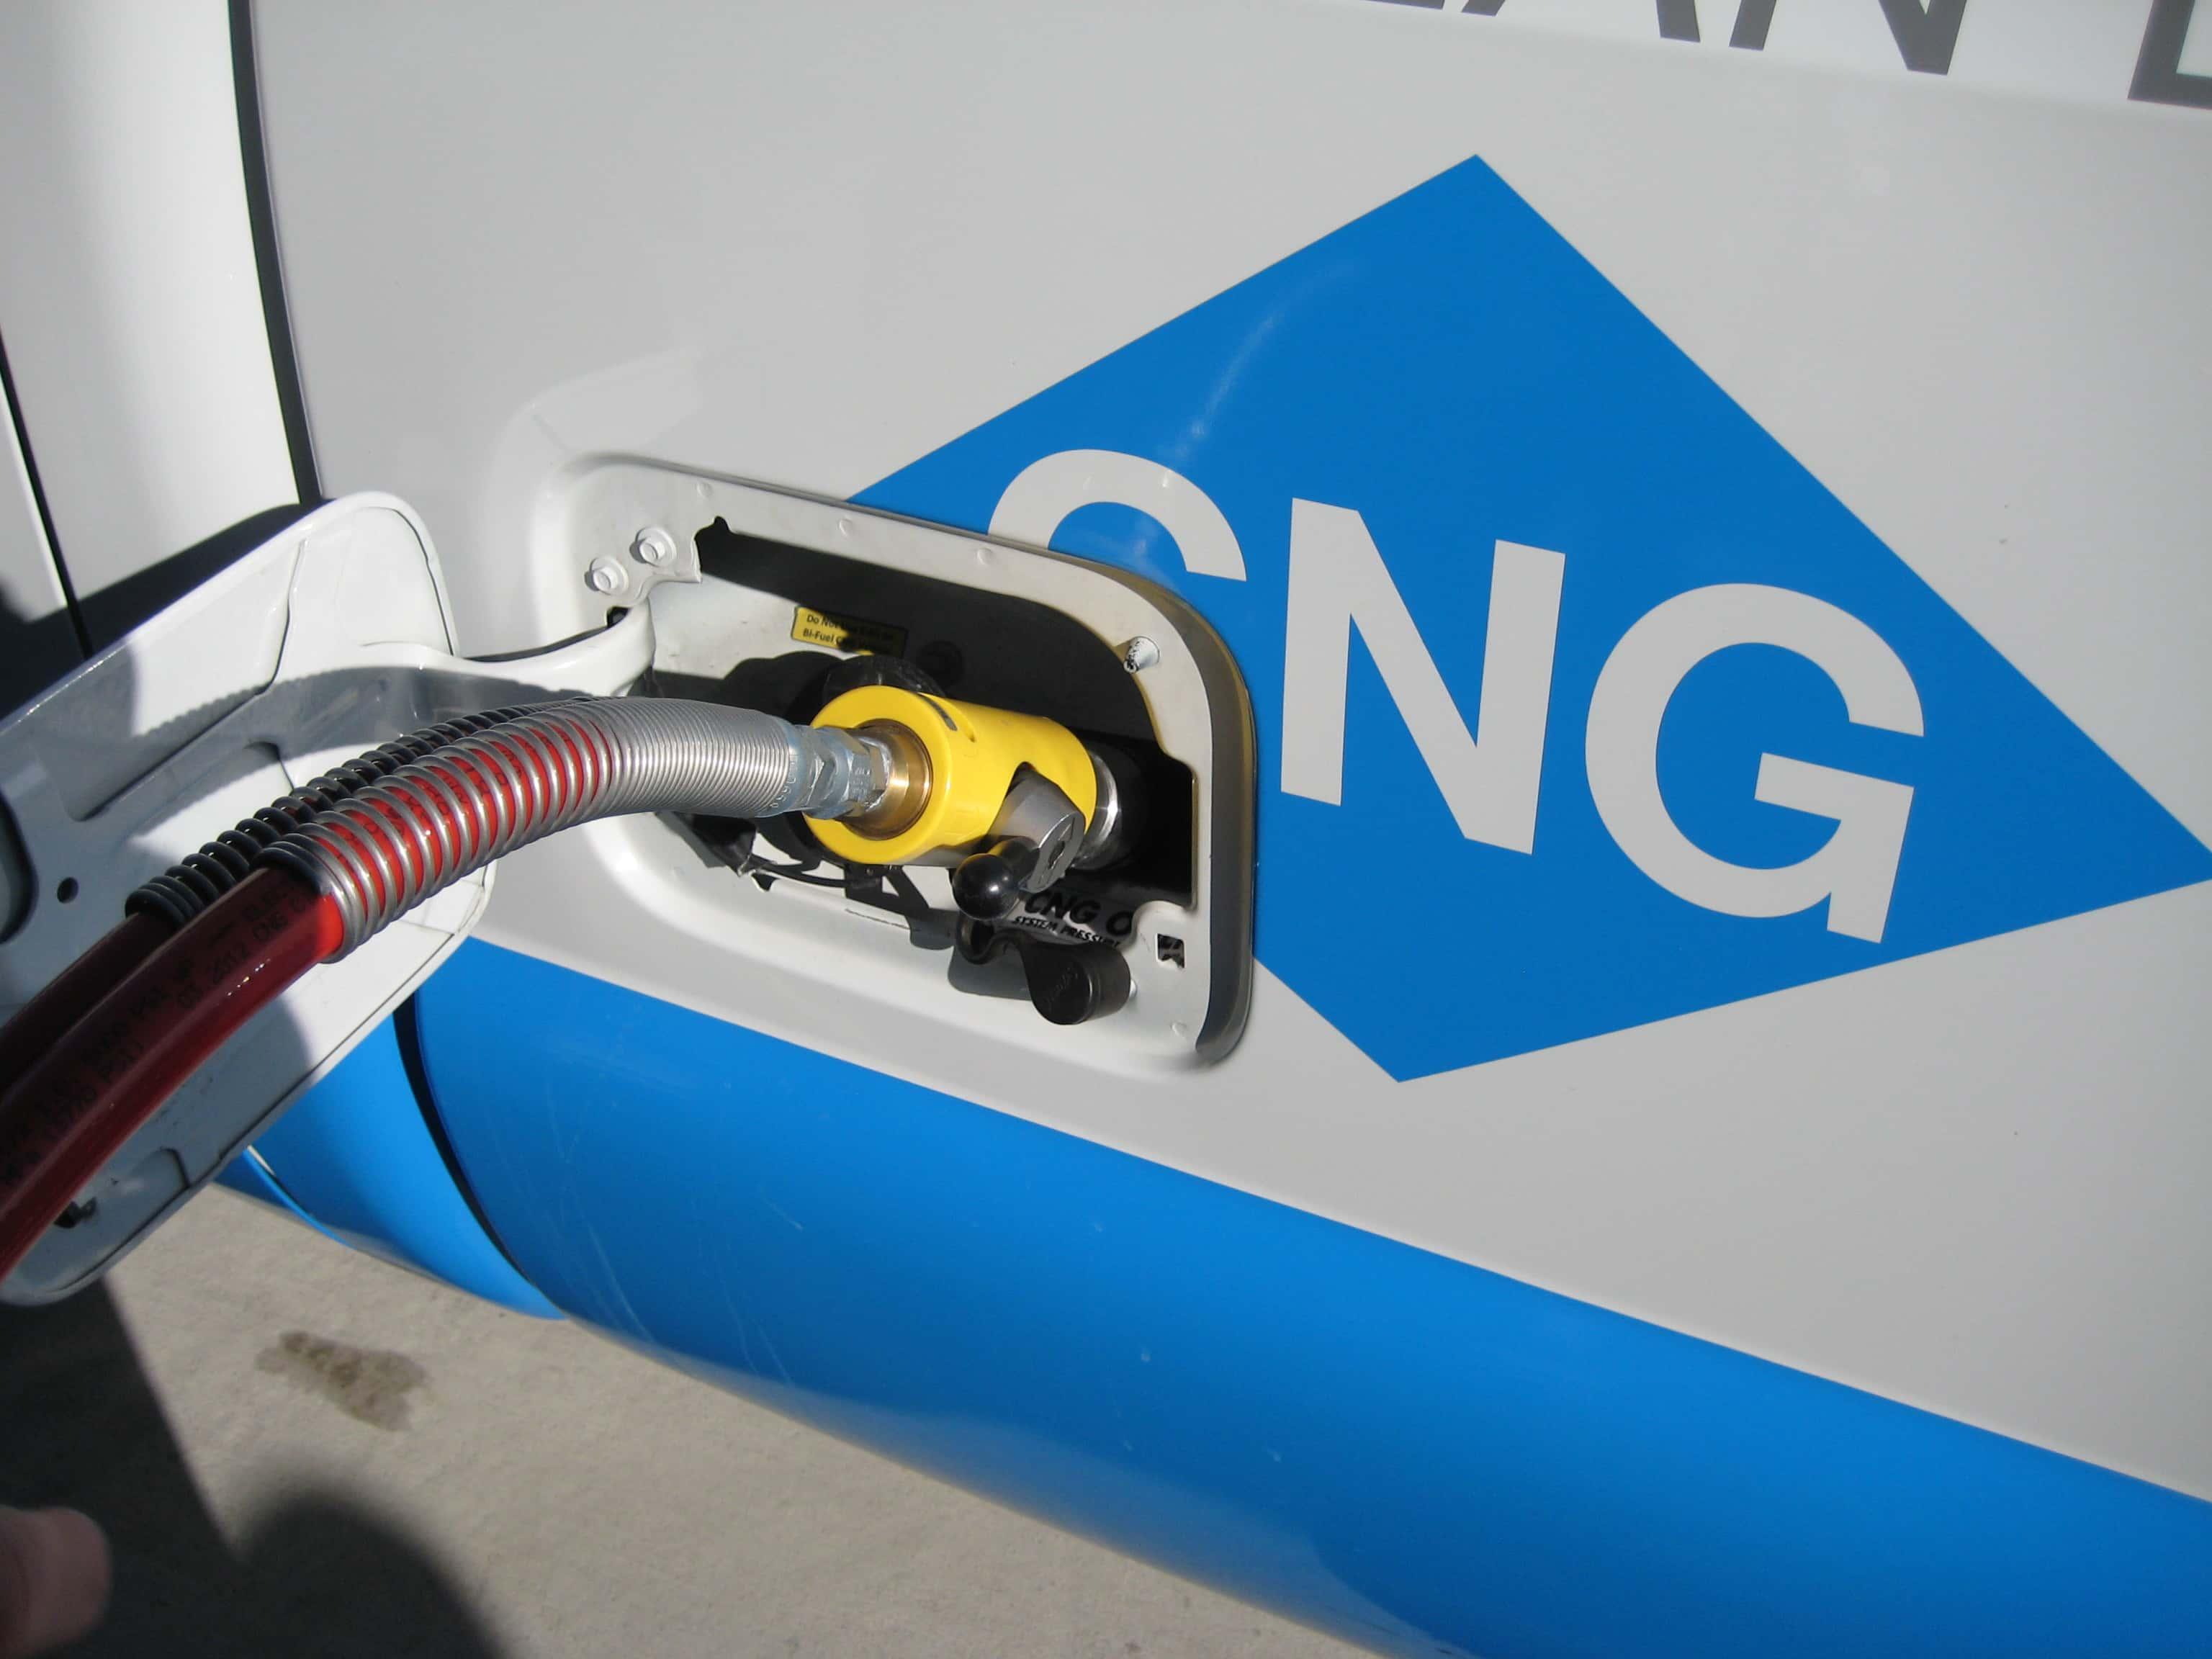 Alternative Fuel Vehicle News Cng News Ngt News Next